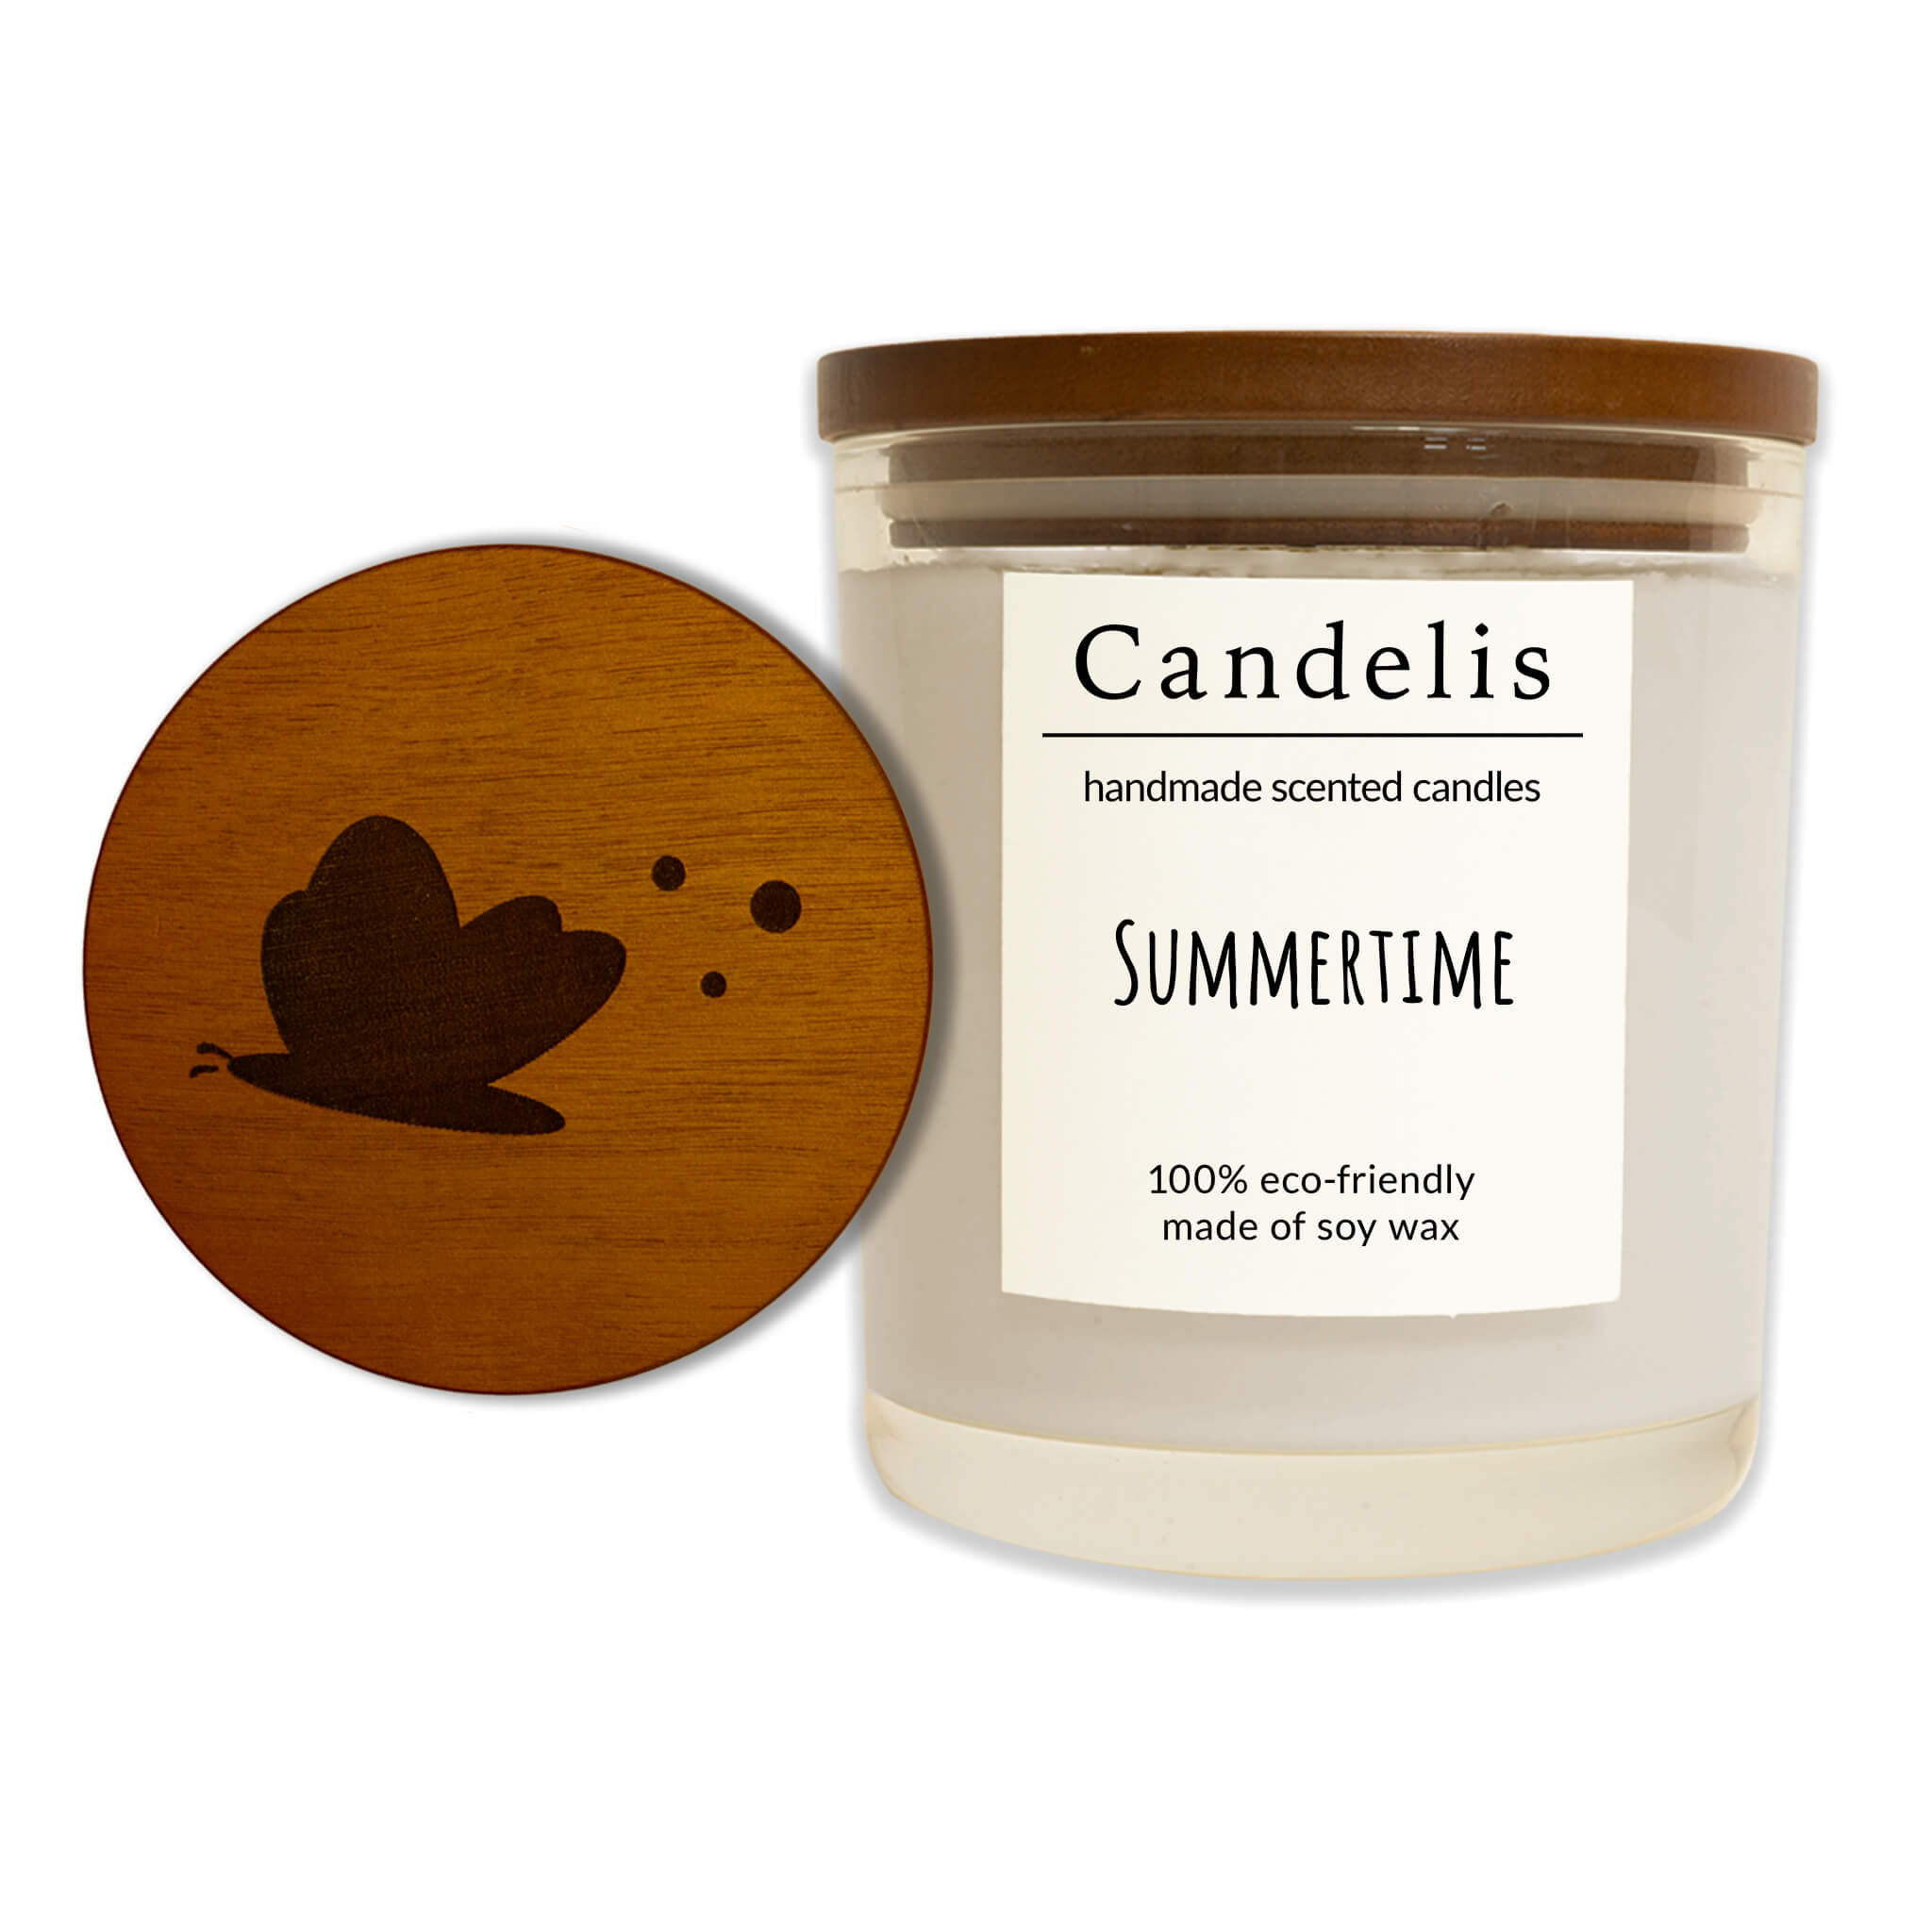 Summertime basis collectie single